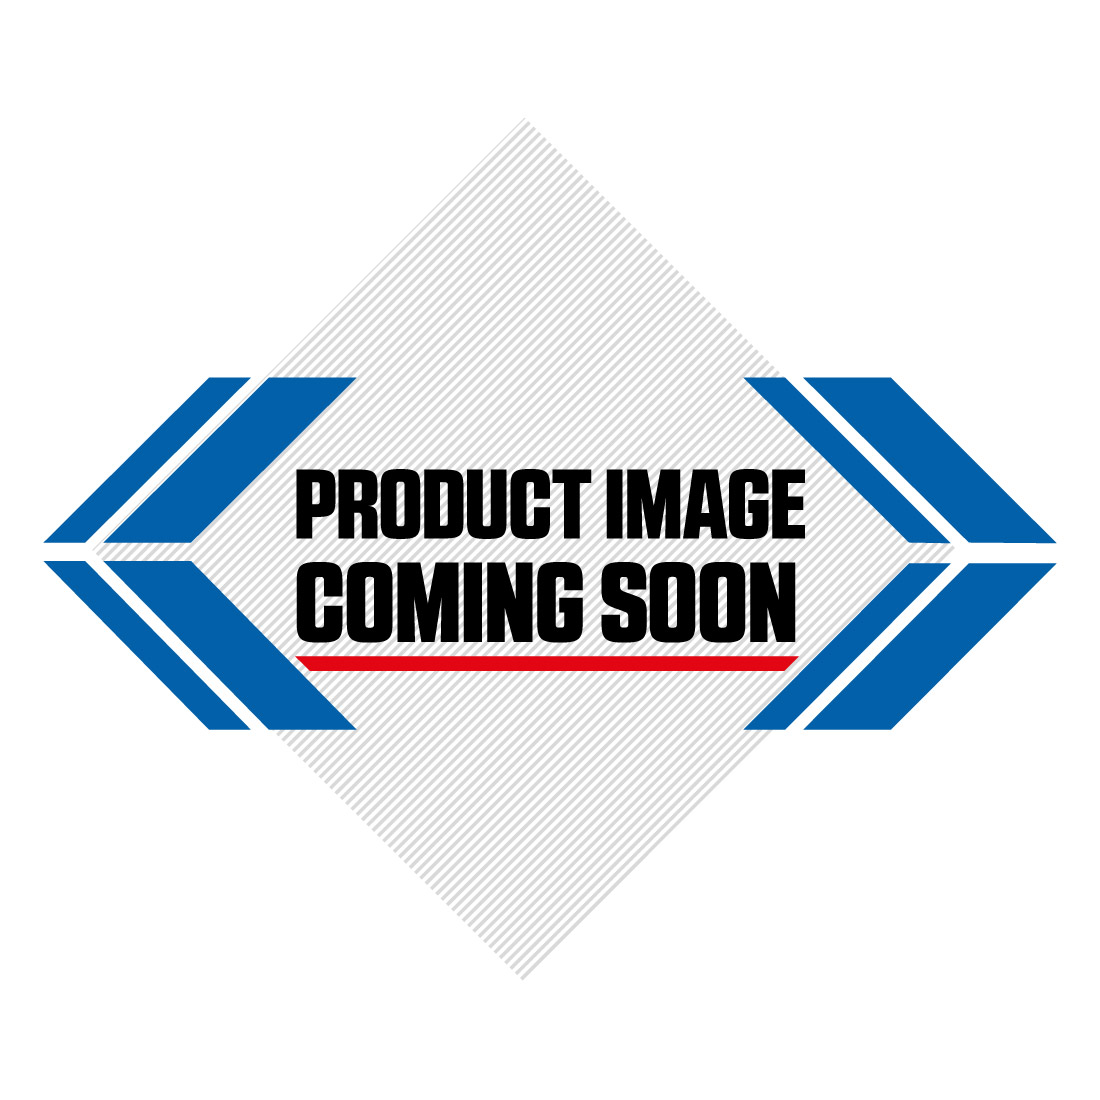 UFO KTM Plastic Kit SX 125 150 250 SXF 250 350 450 (16-18) OEM 17 Image-2>